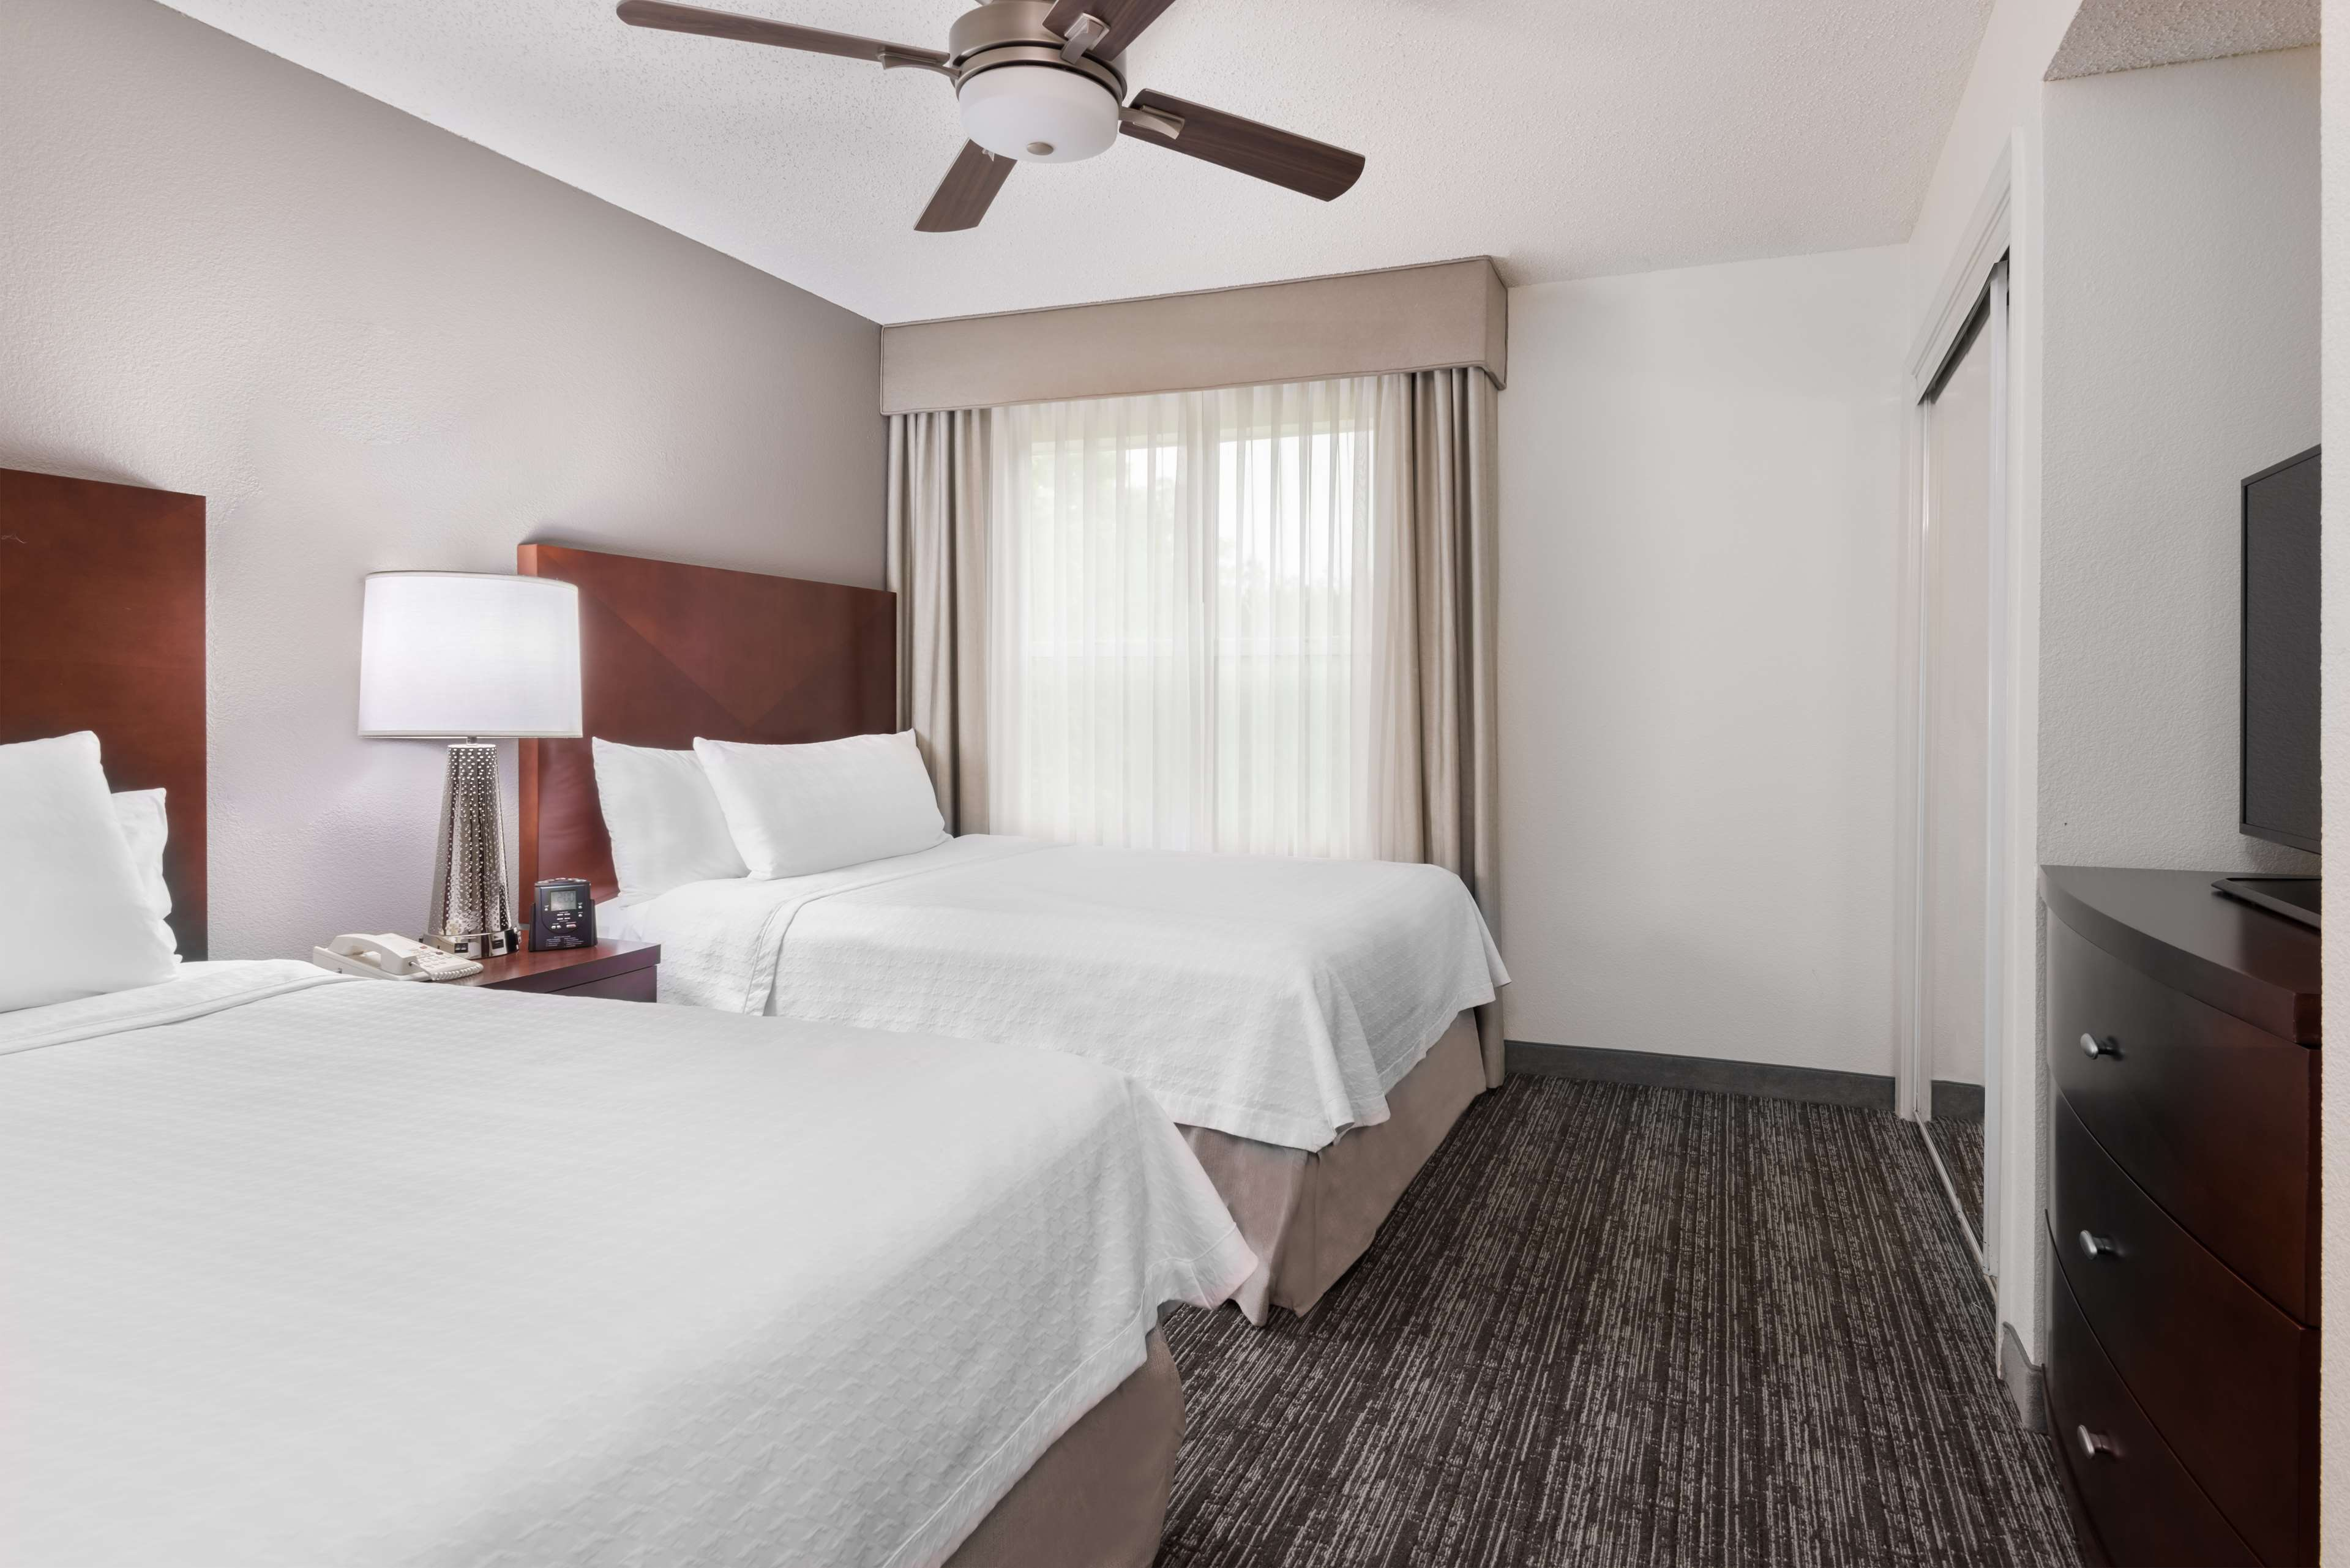 Homewood Suites by Hilton Charlotte-North/Univ Research Park image 14